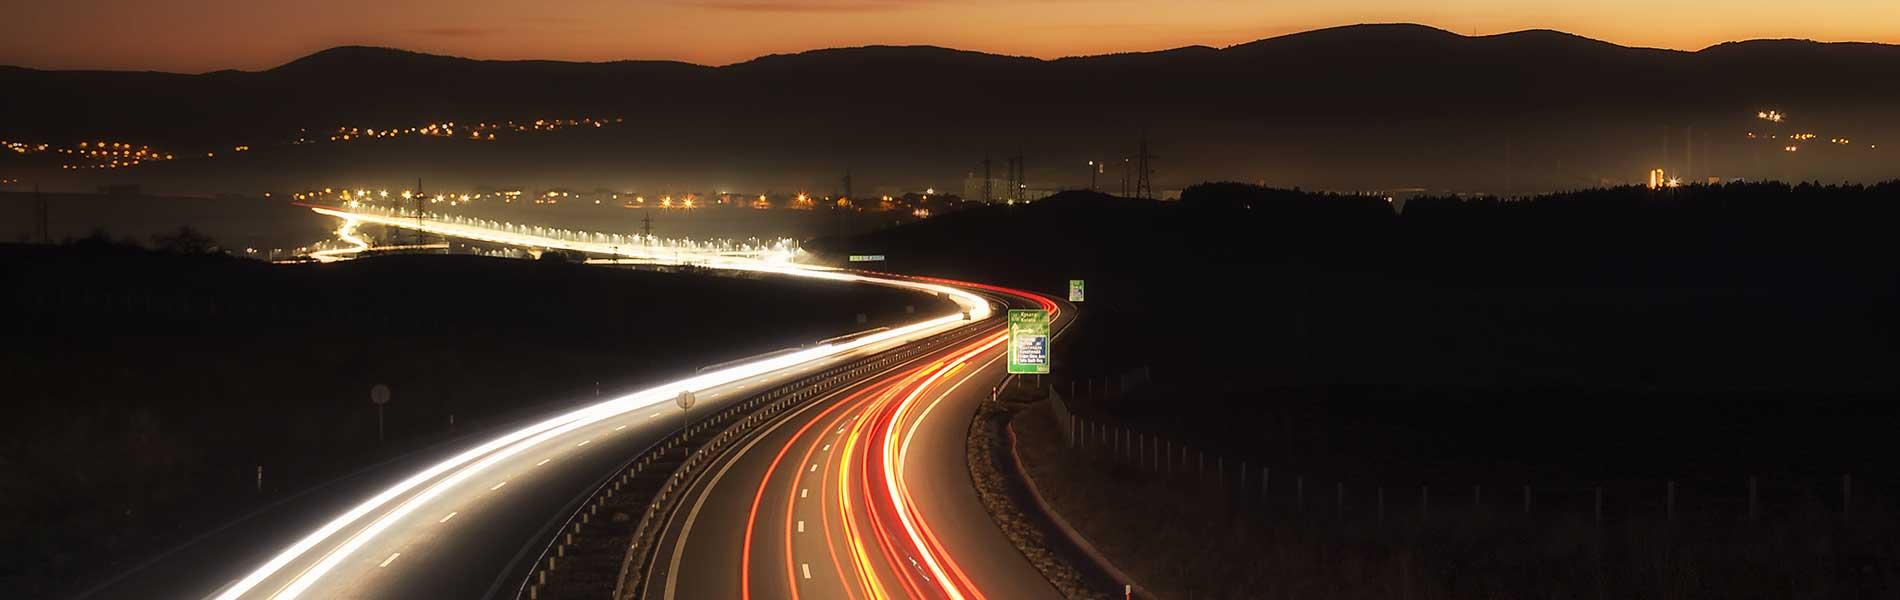 Traffic Citations